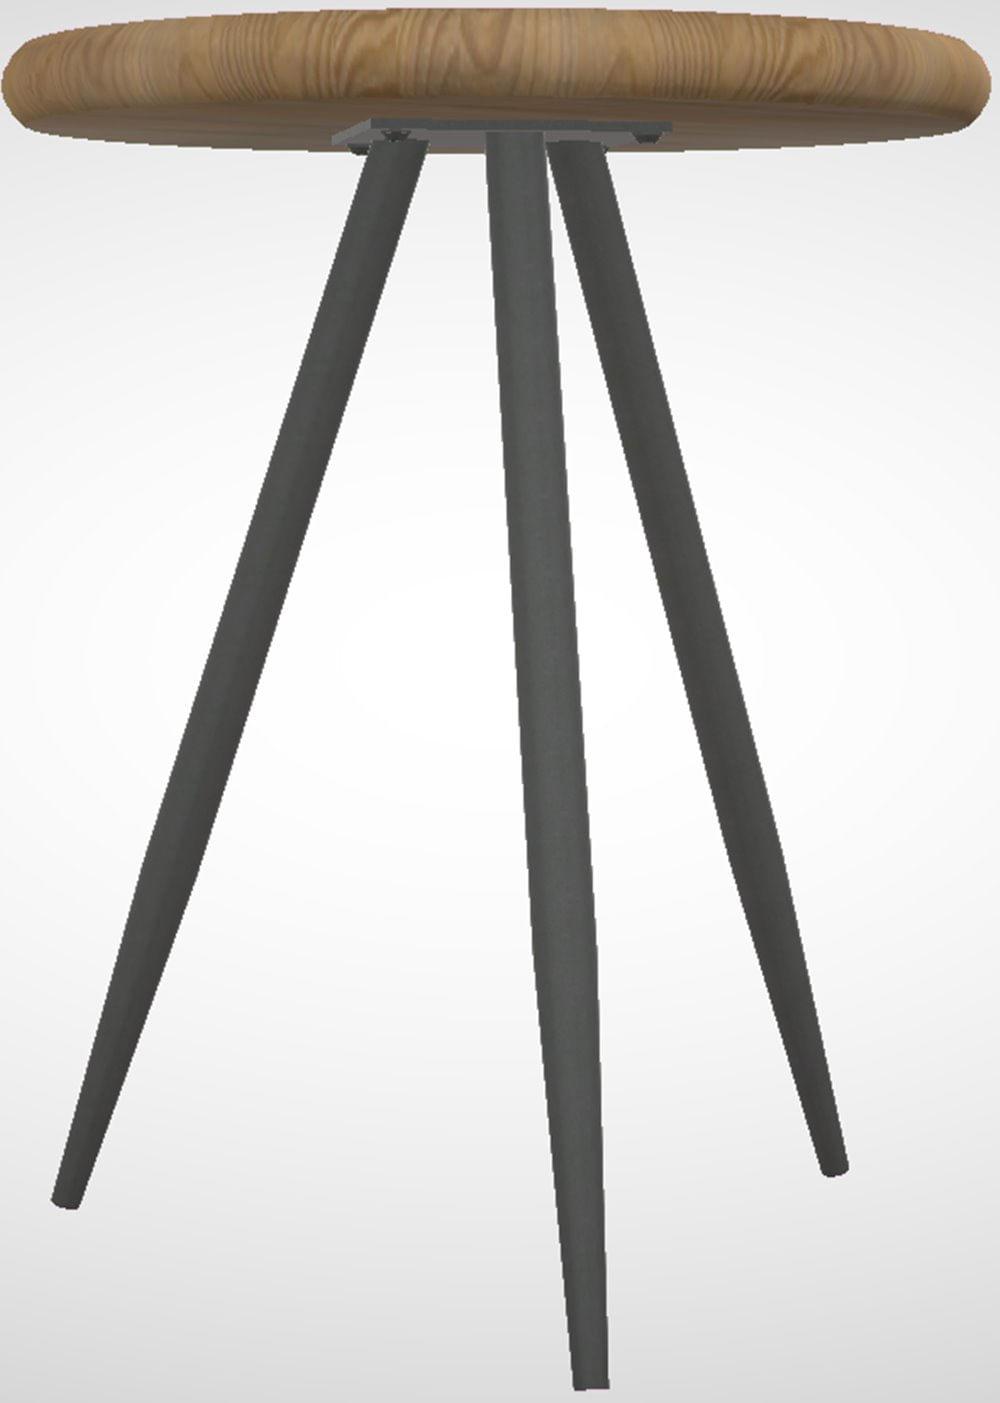 Mesa Lateral Redonda Trianon Metal Grafite Driftwood 50 cm (LARG) - 44893